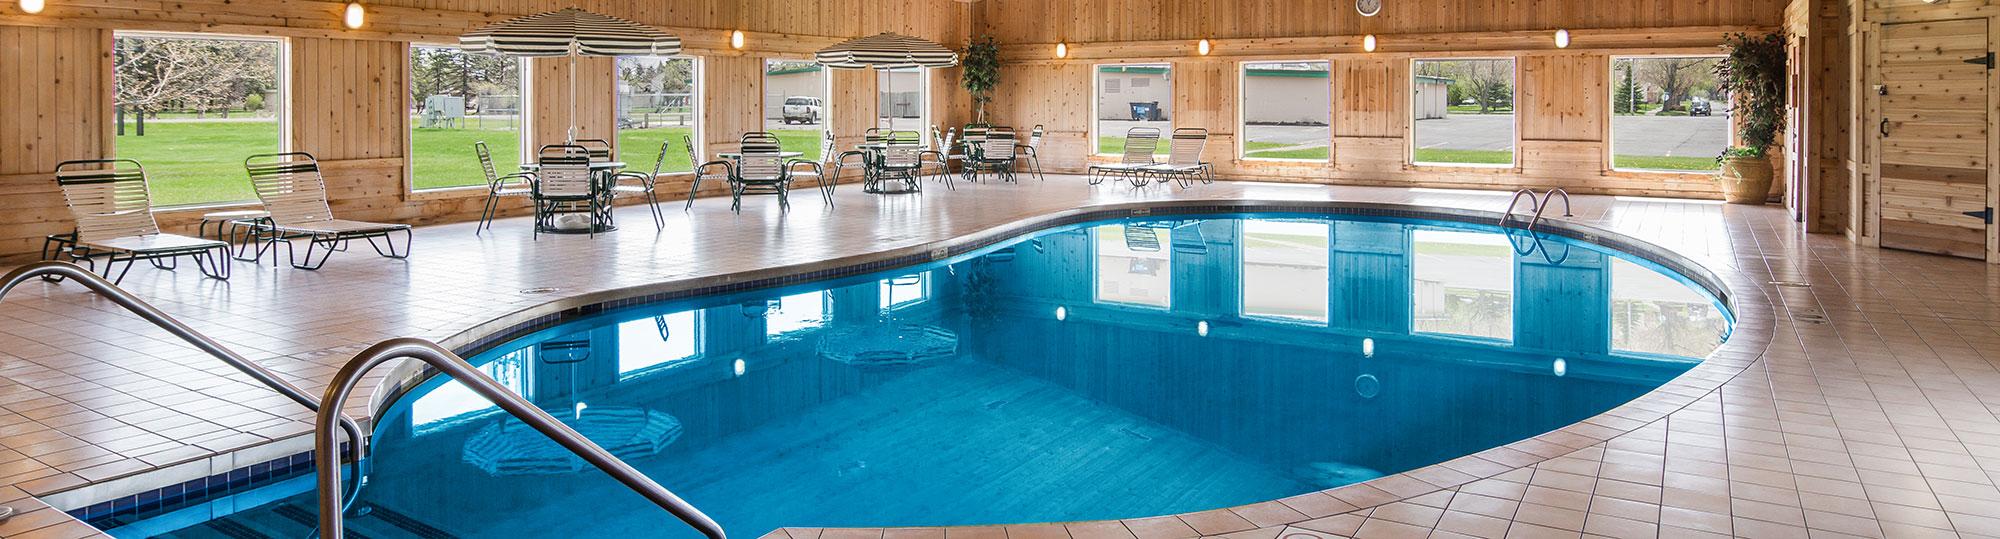 Boarders Inn & Suites Superior